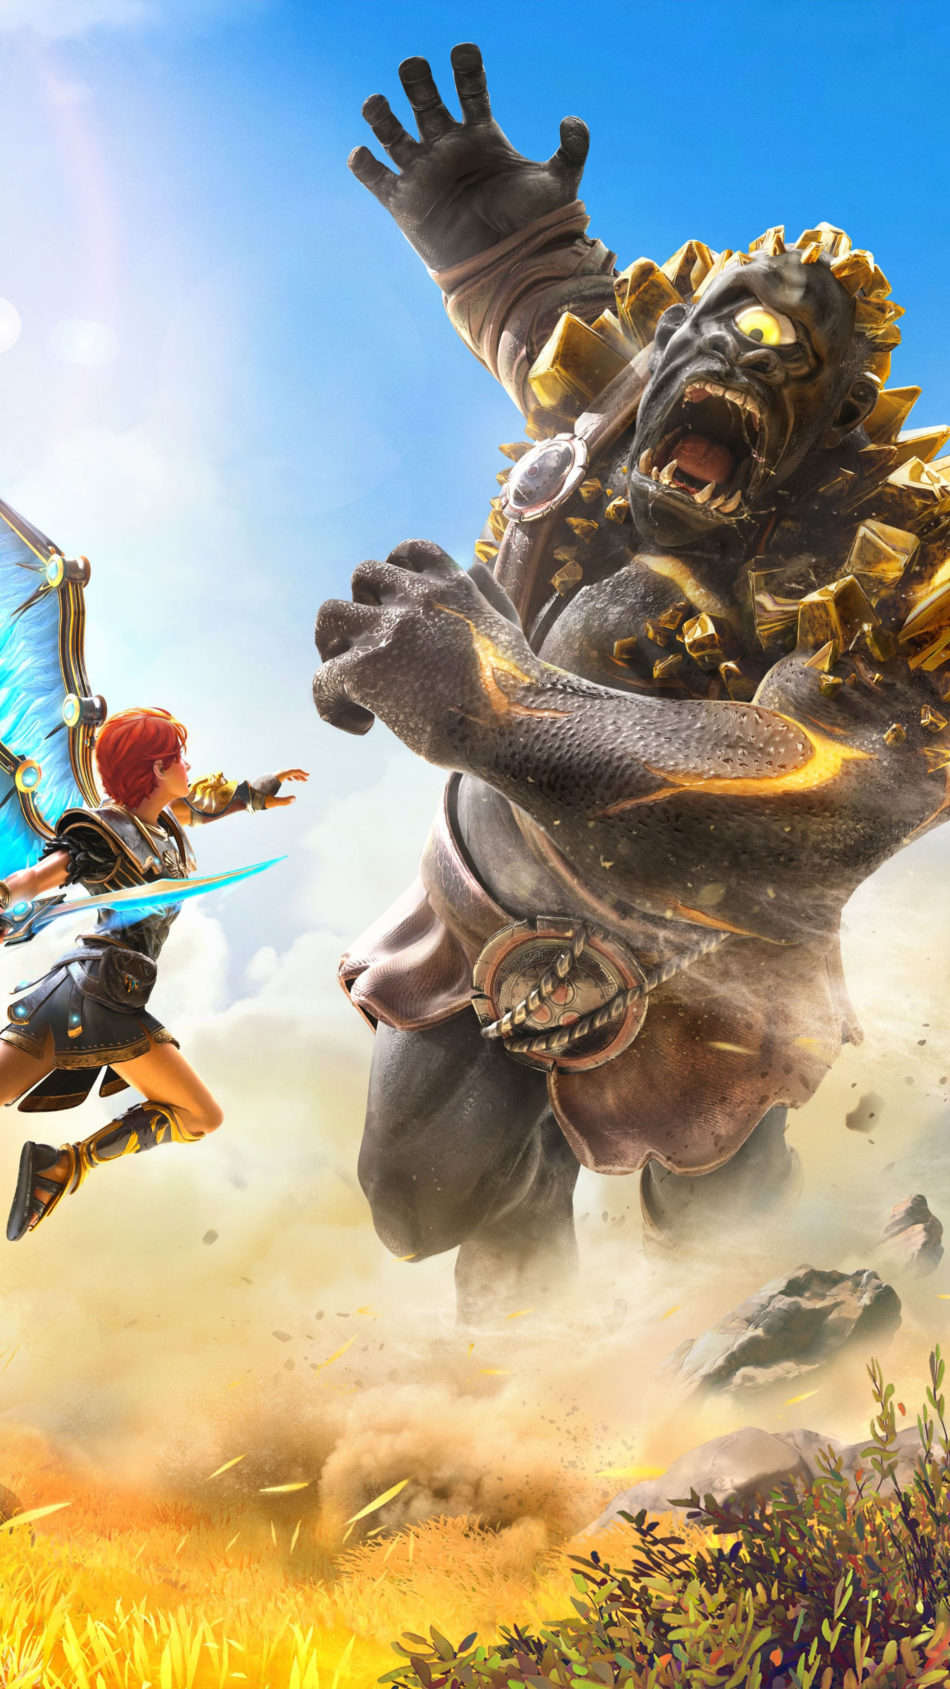 Immortals Fenyx Rising Game Poster 4K Ultra HD Mobile Wallpaper